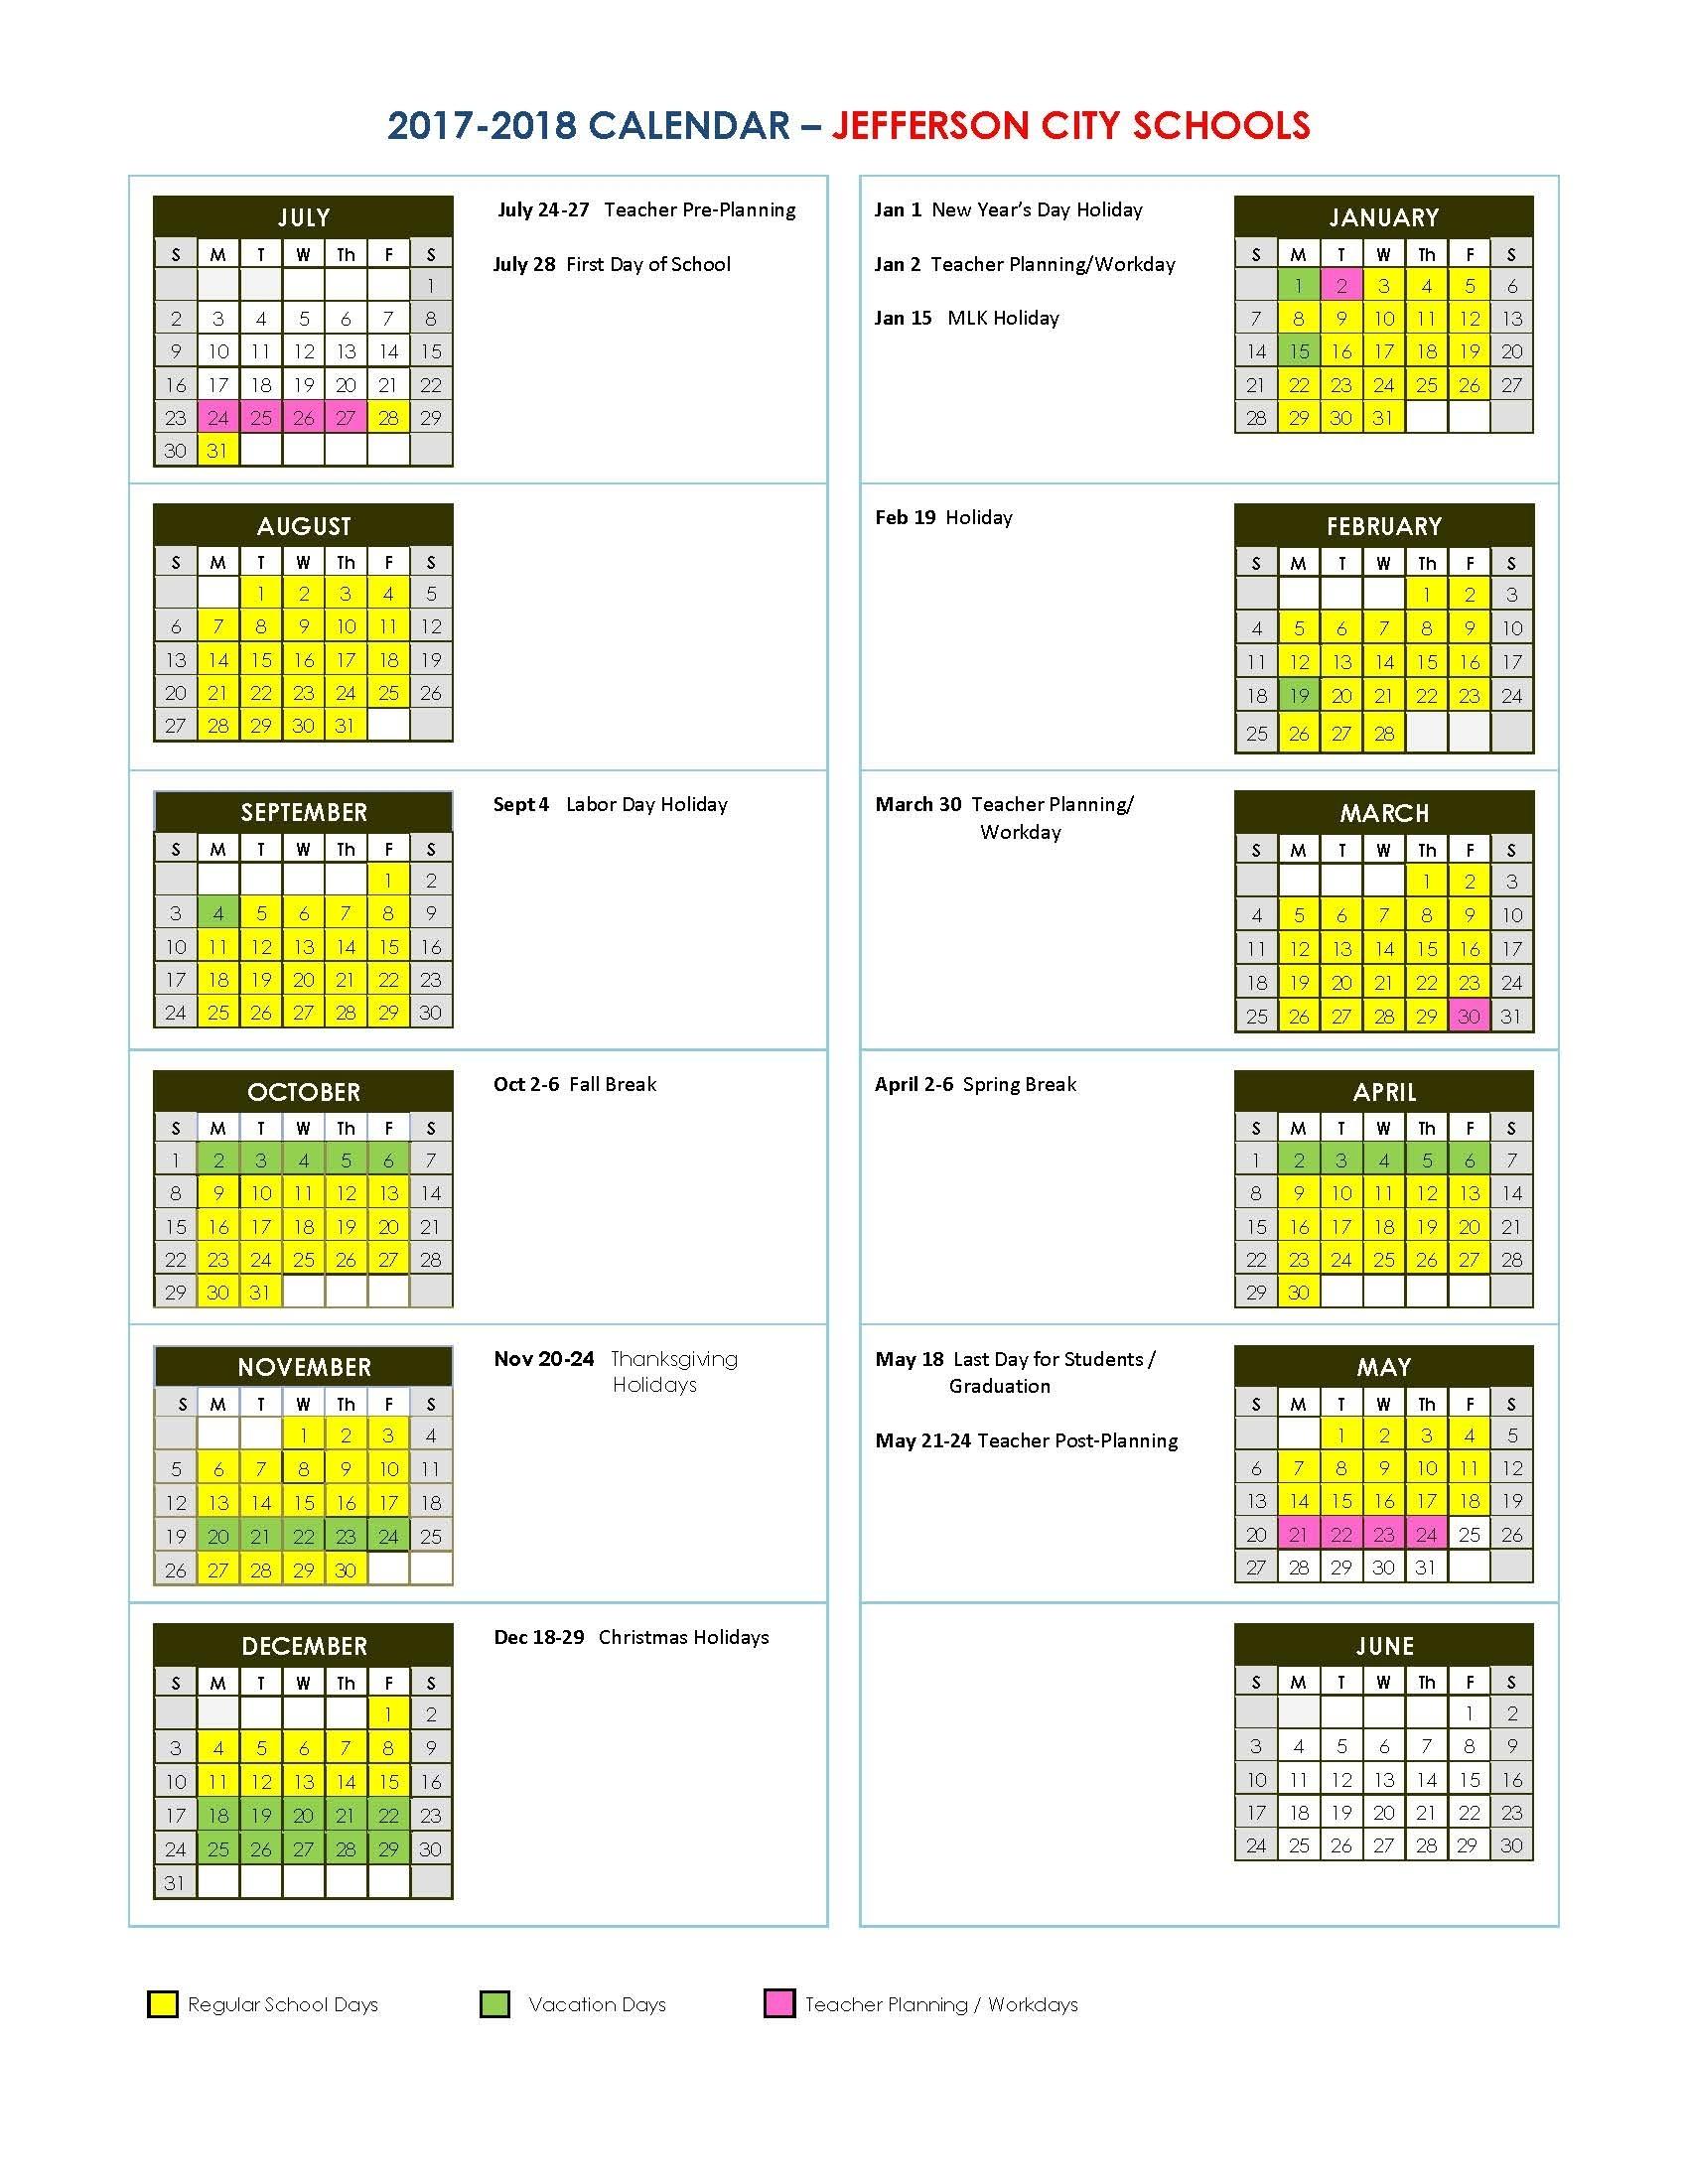 Jefferson City Schools within Uga Calendar 2019 2020